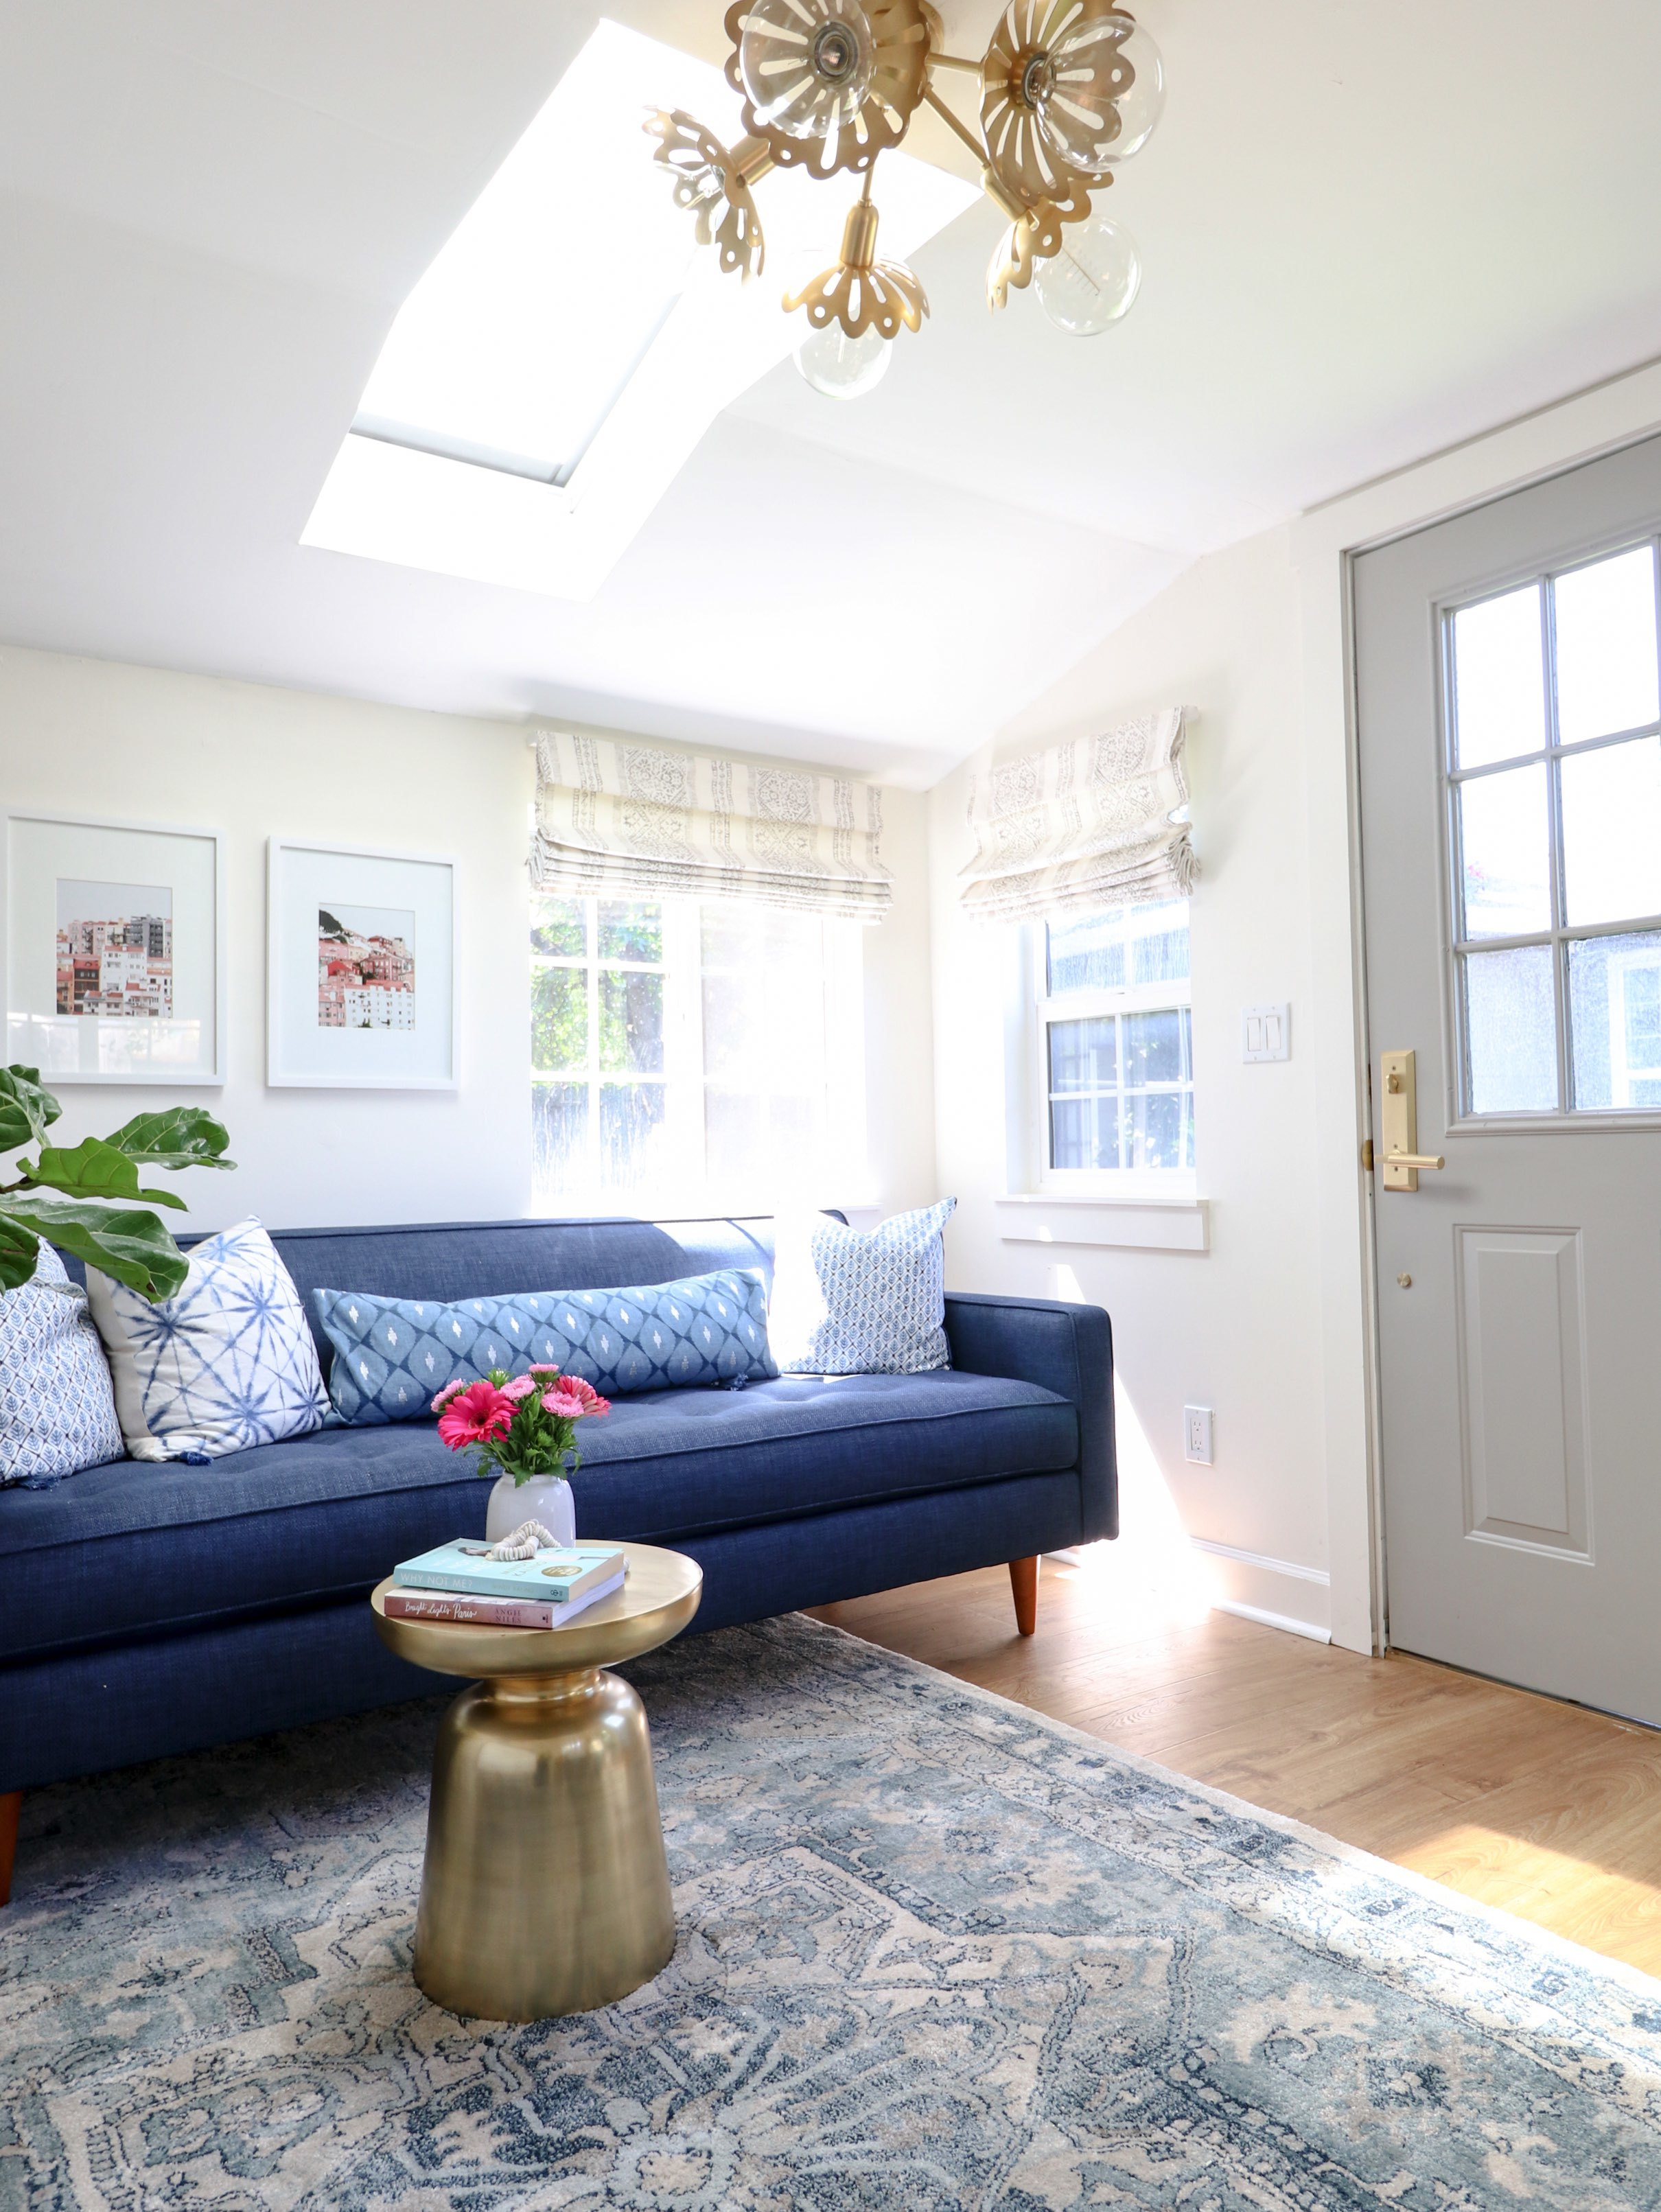 Blue sofa under a skylight brass pendant